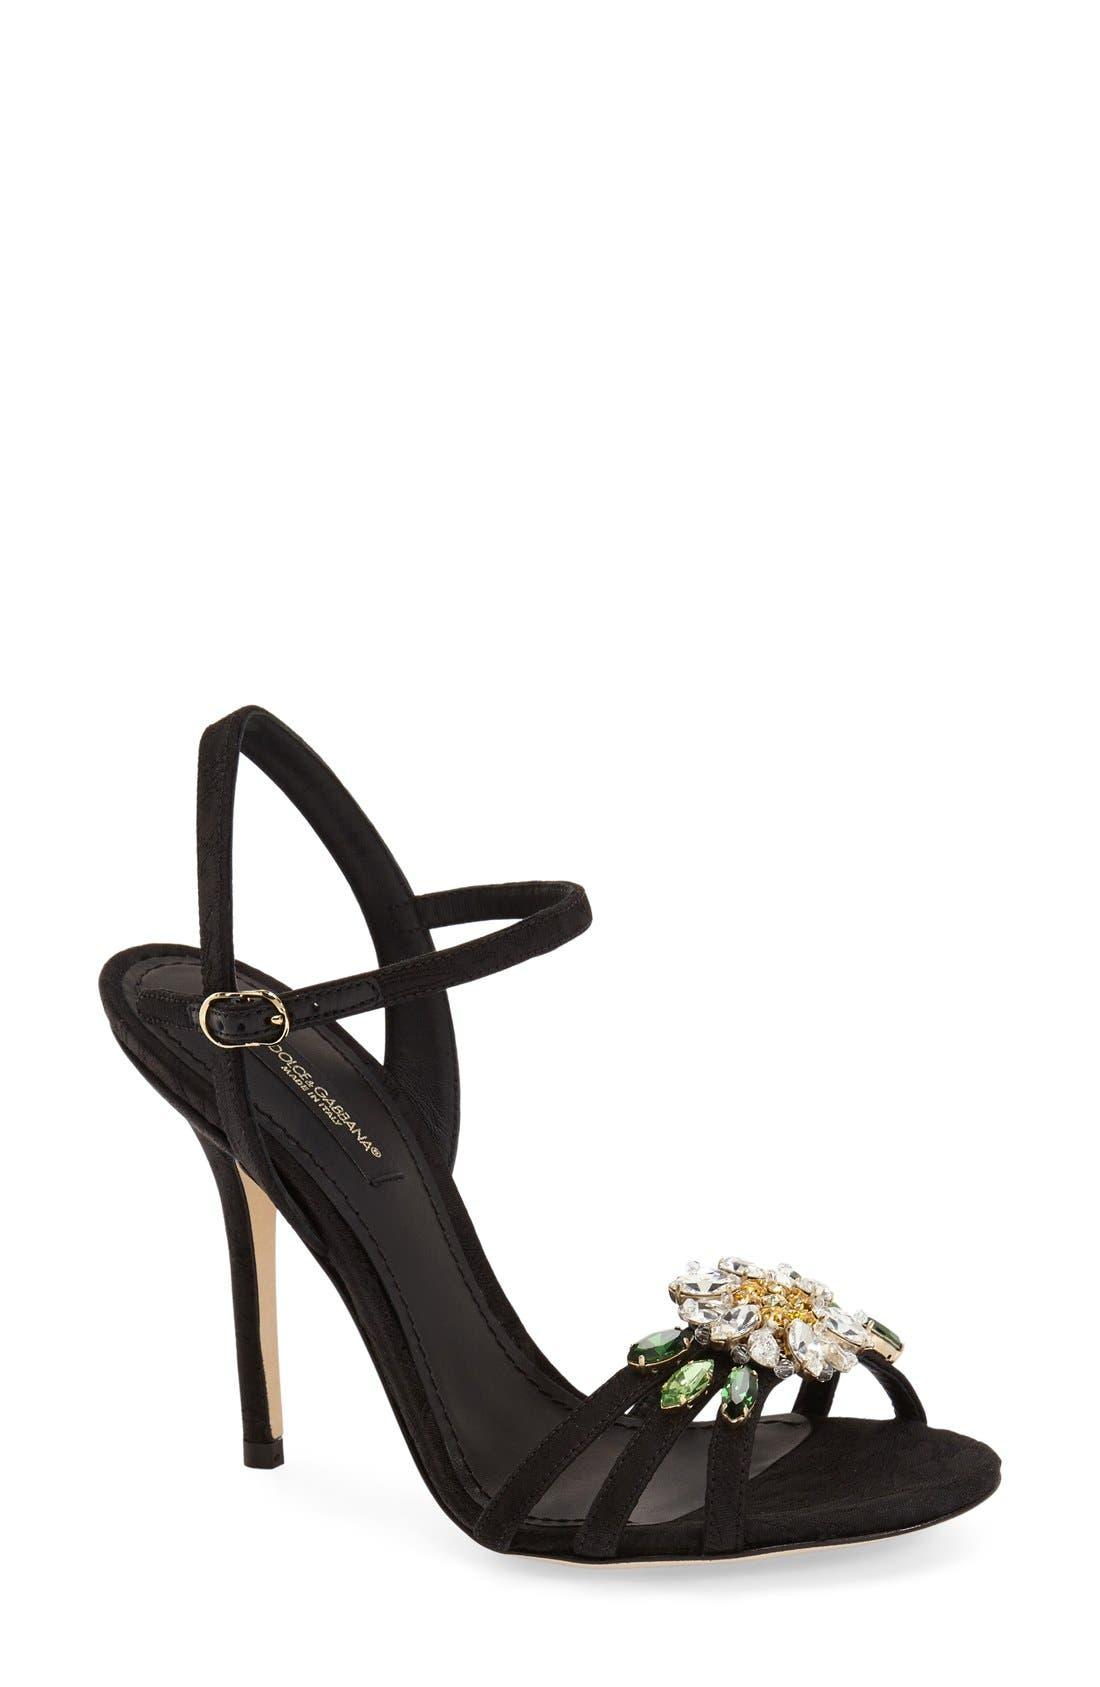 DOLCE&GABBANA Jeweled Strappy Sandal, Main, color, 001